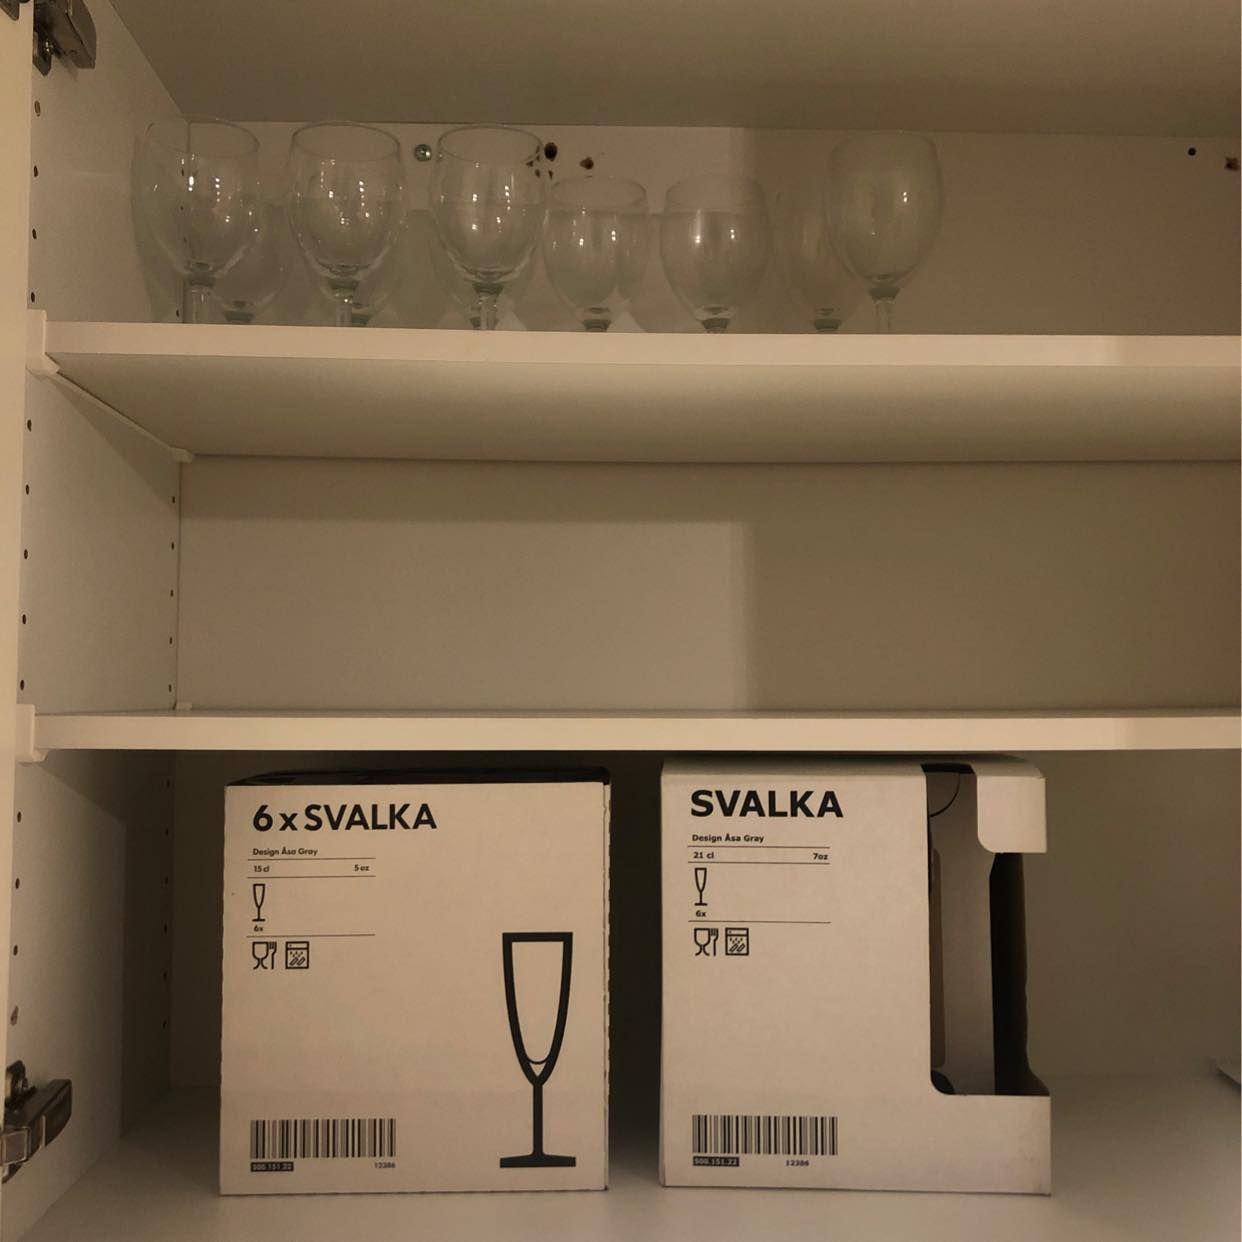 image of Vinglas och champagne - Stockholms Stad